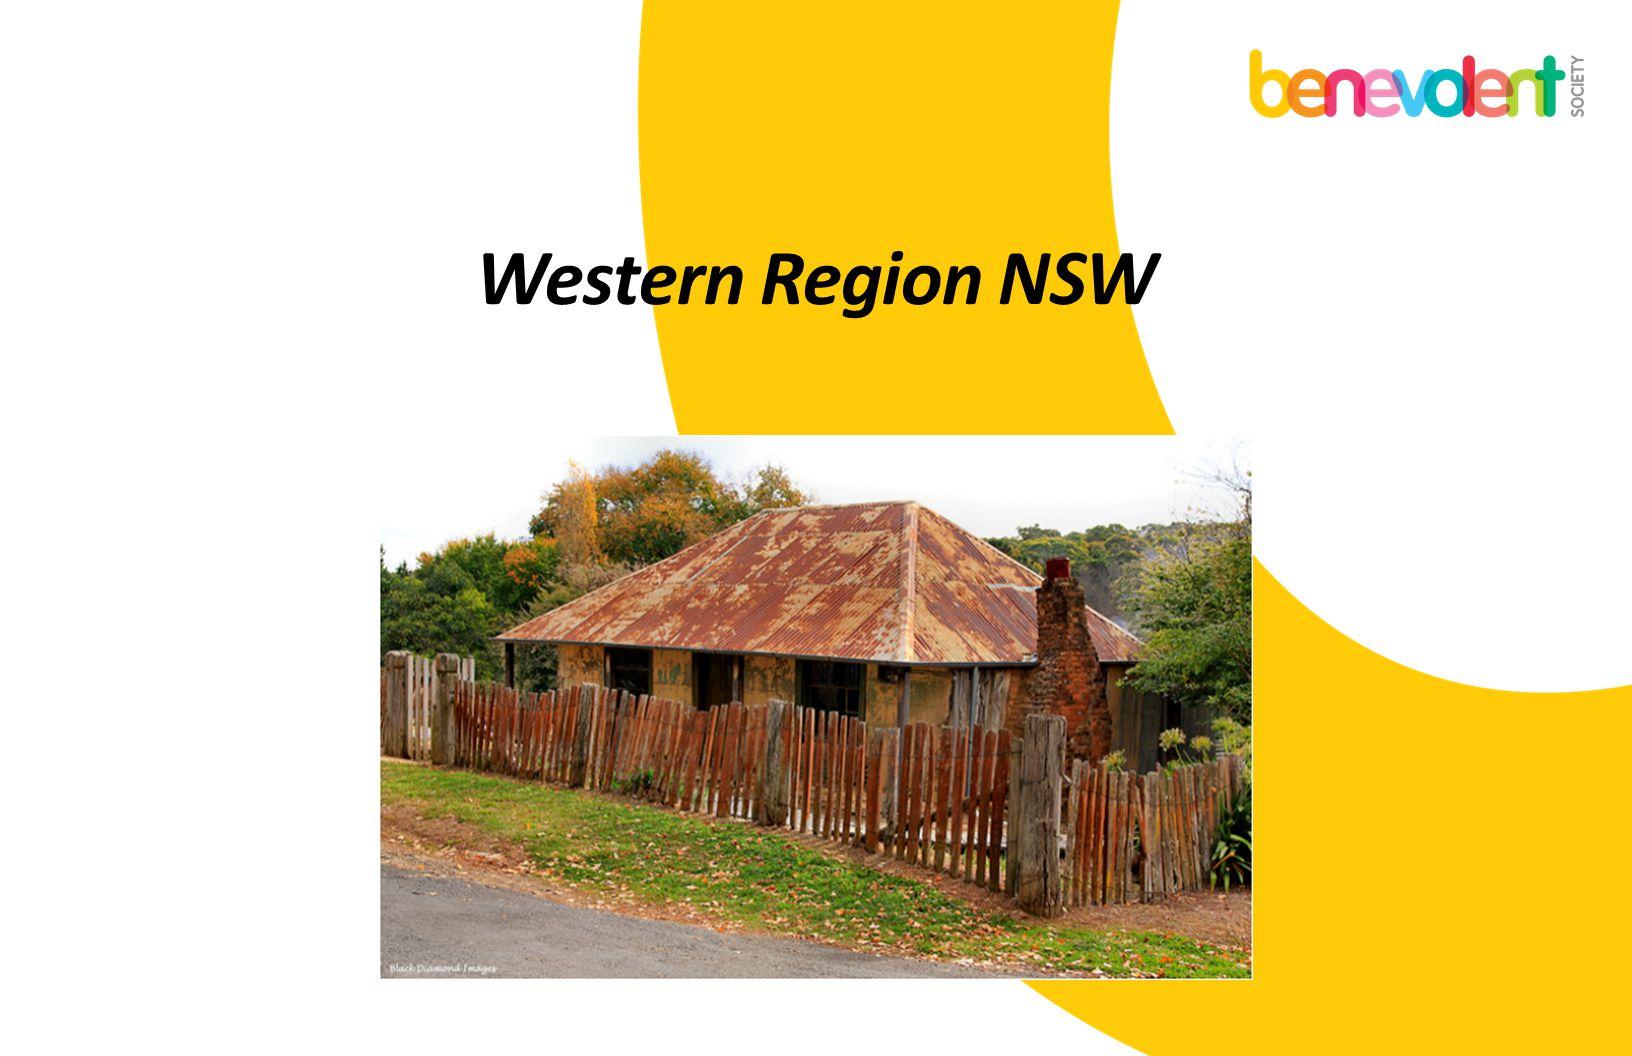 Western Region NSW